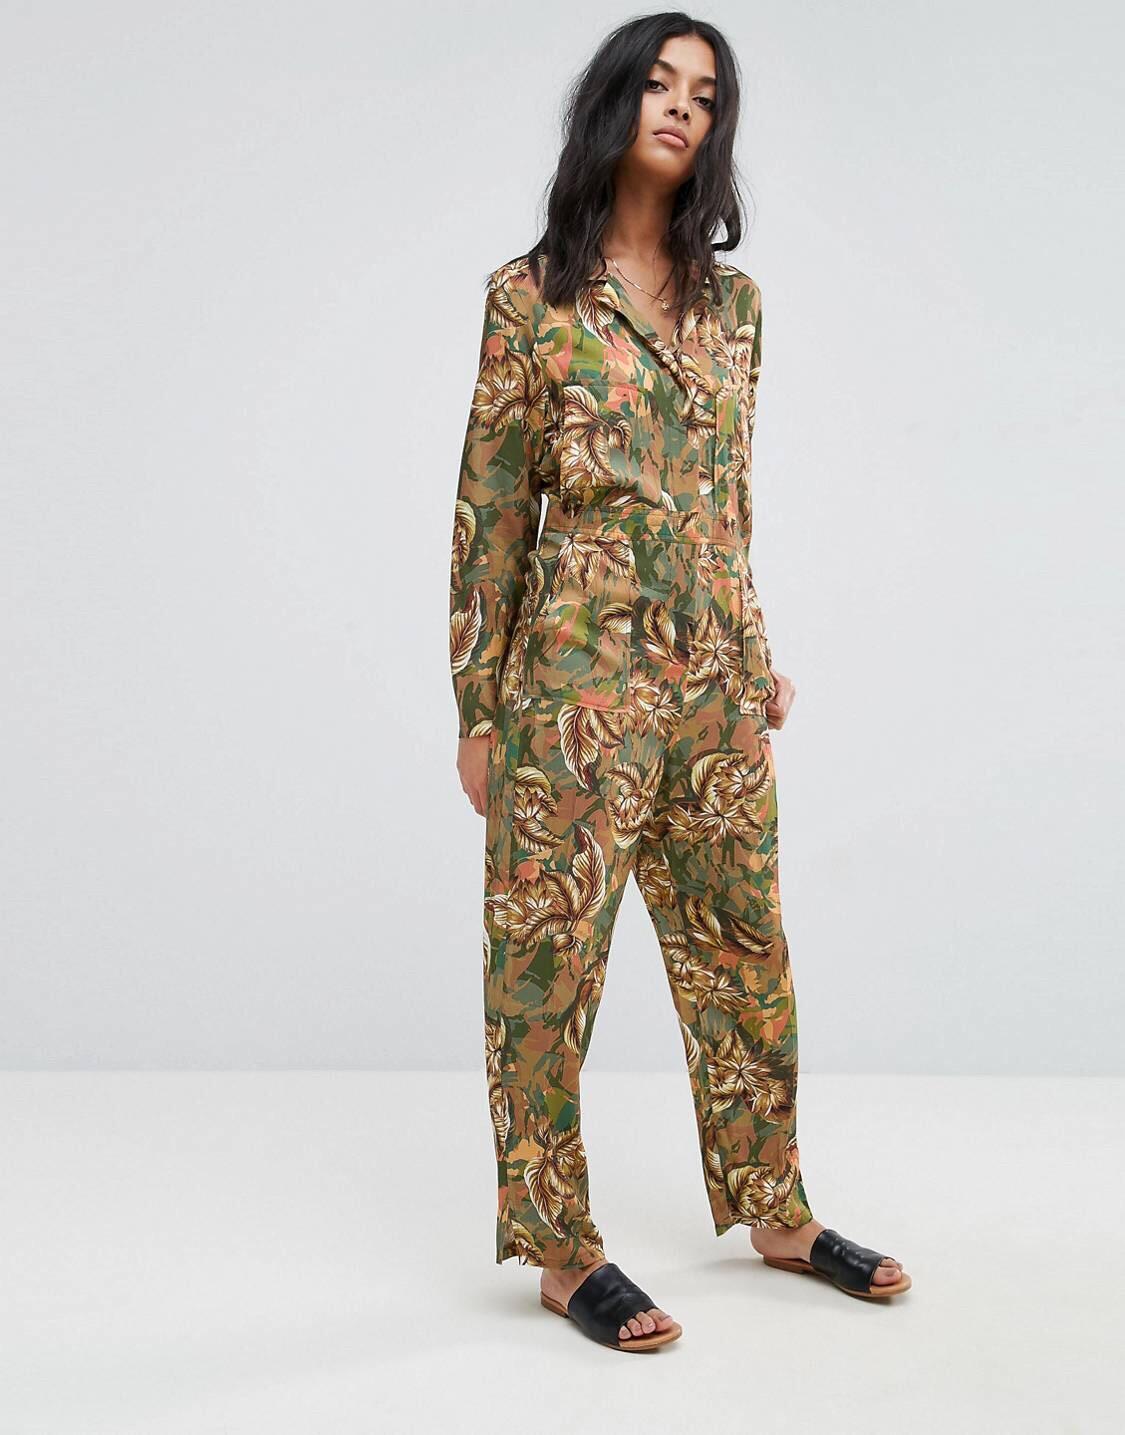 A modest girls dream - I love - again, ima write on jumpsuits I'm obsessing over soon